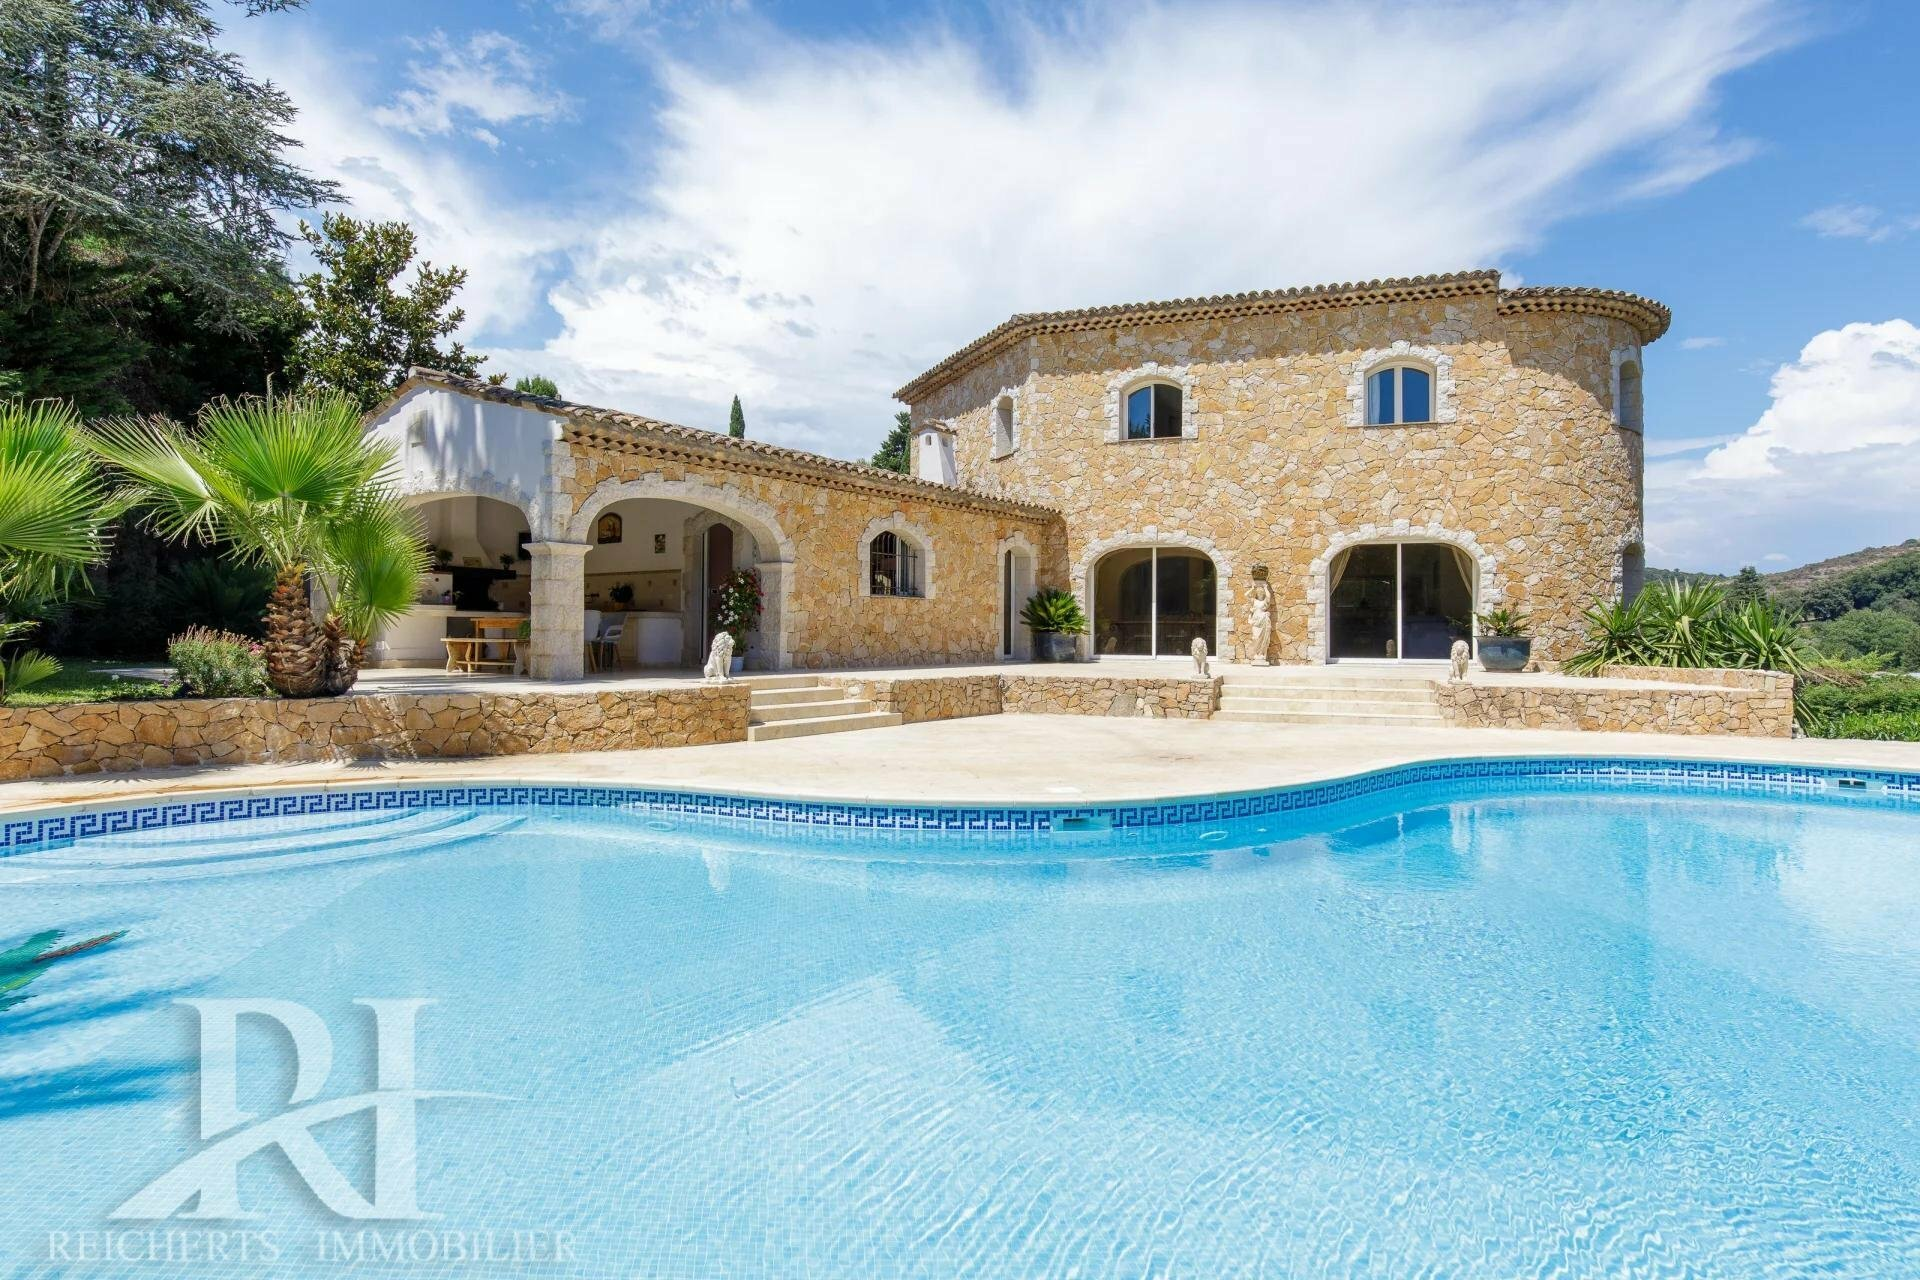 Villa in Biot, Provence-Alpes-Côte d'Azur, France 1 - 11528431